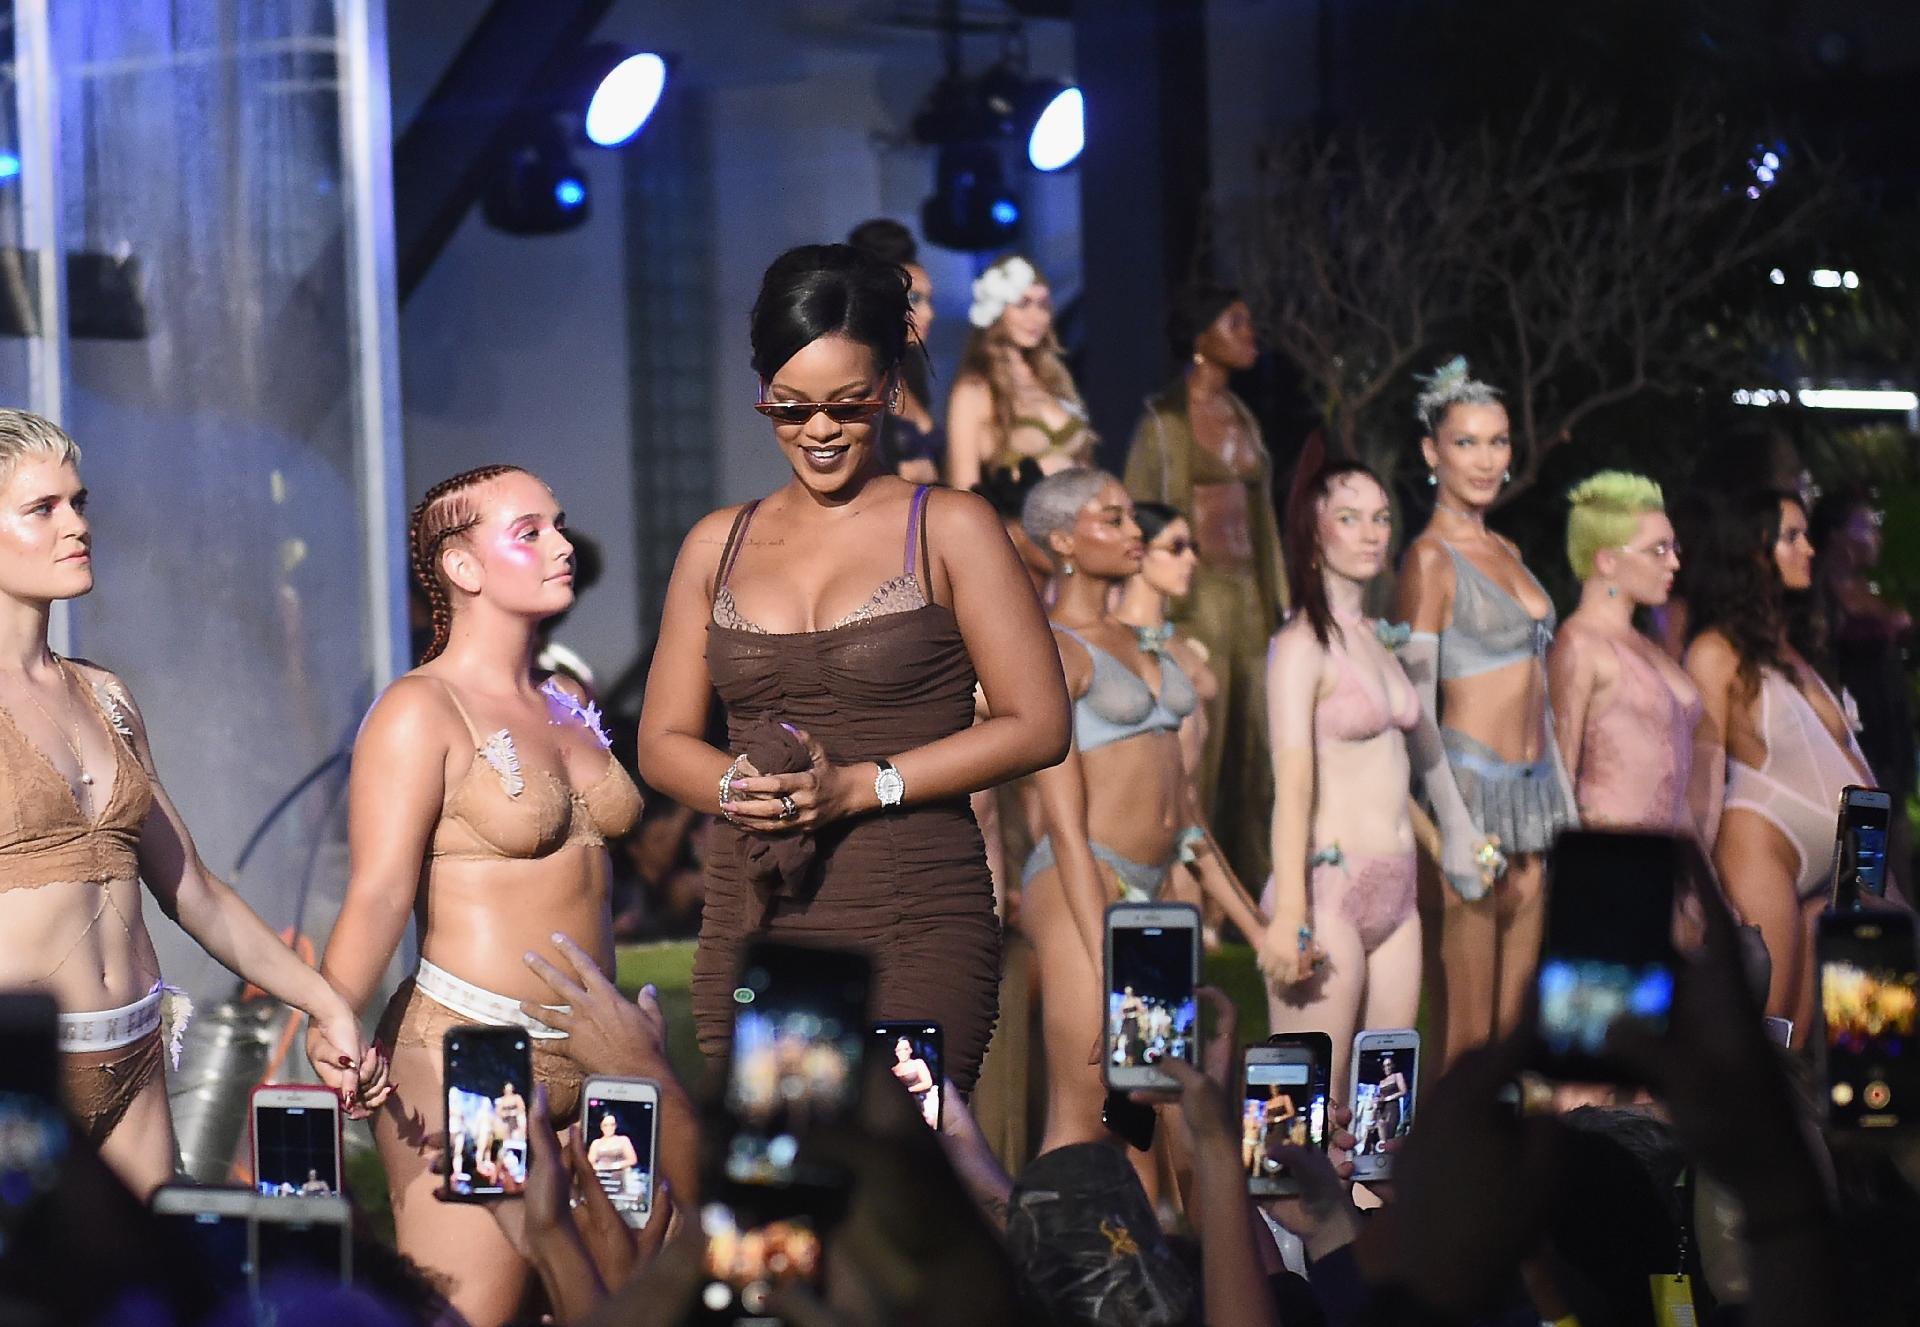 9bc715a6d Desfile de lingerie de Rihanna ataca modelo da Victoria s Secret -  14 09 2018 - UOL Universa